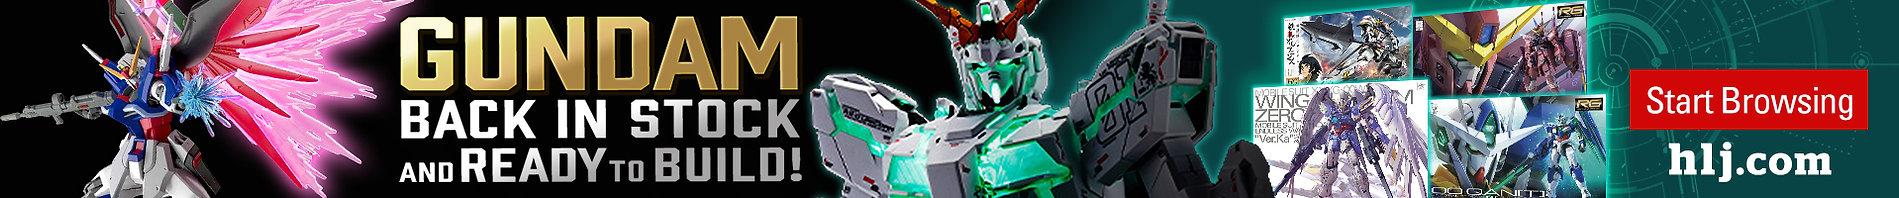 Gundam_New_Arrivals_2021_05_1920x200.jpg